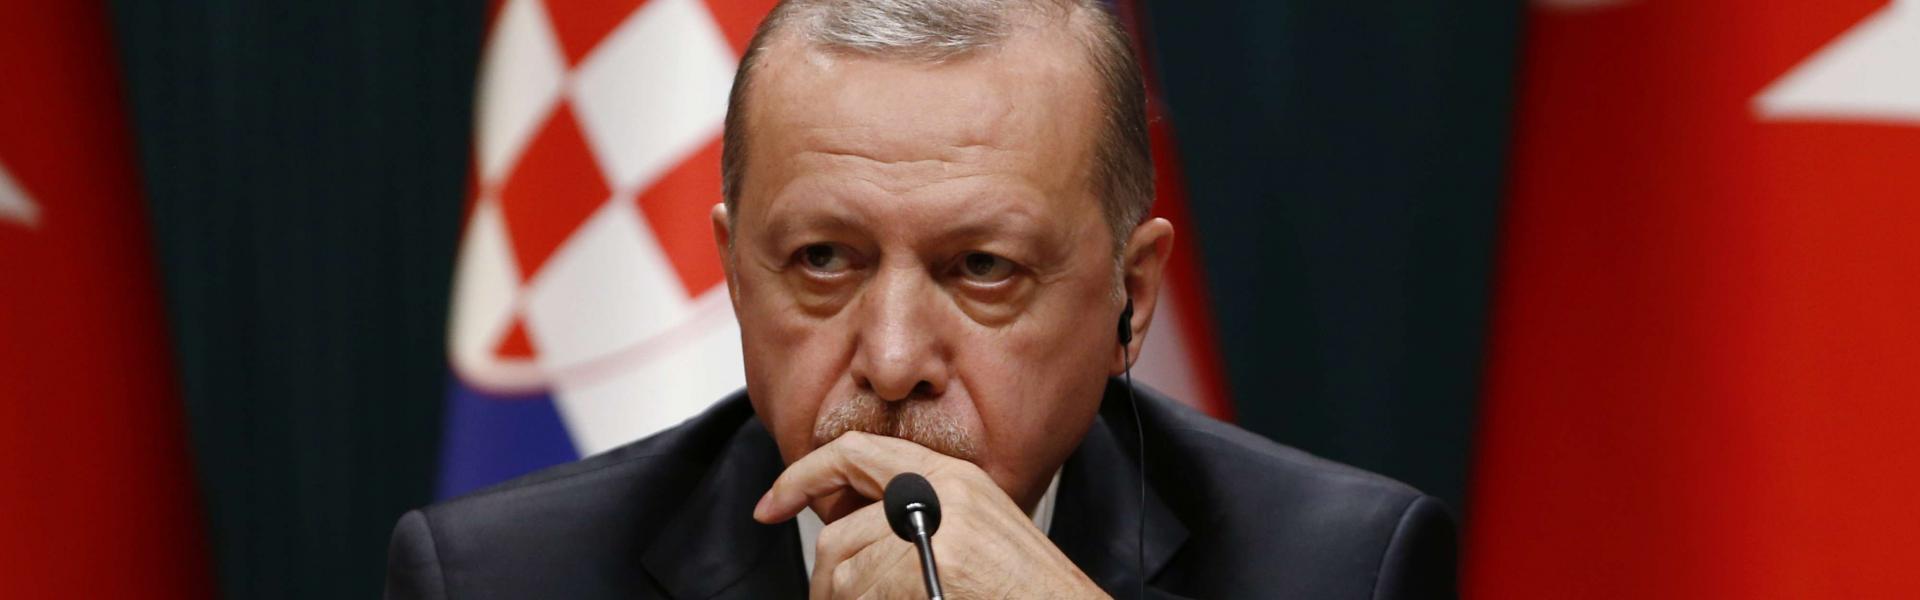 Can Turkey's Erdoğan accept defeat? - Politico